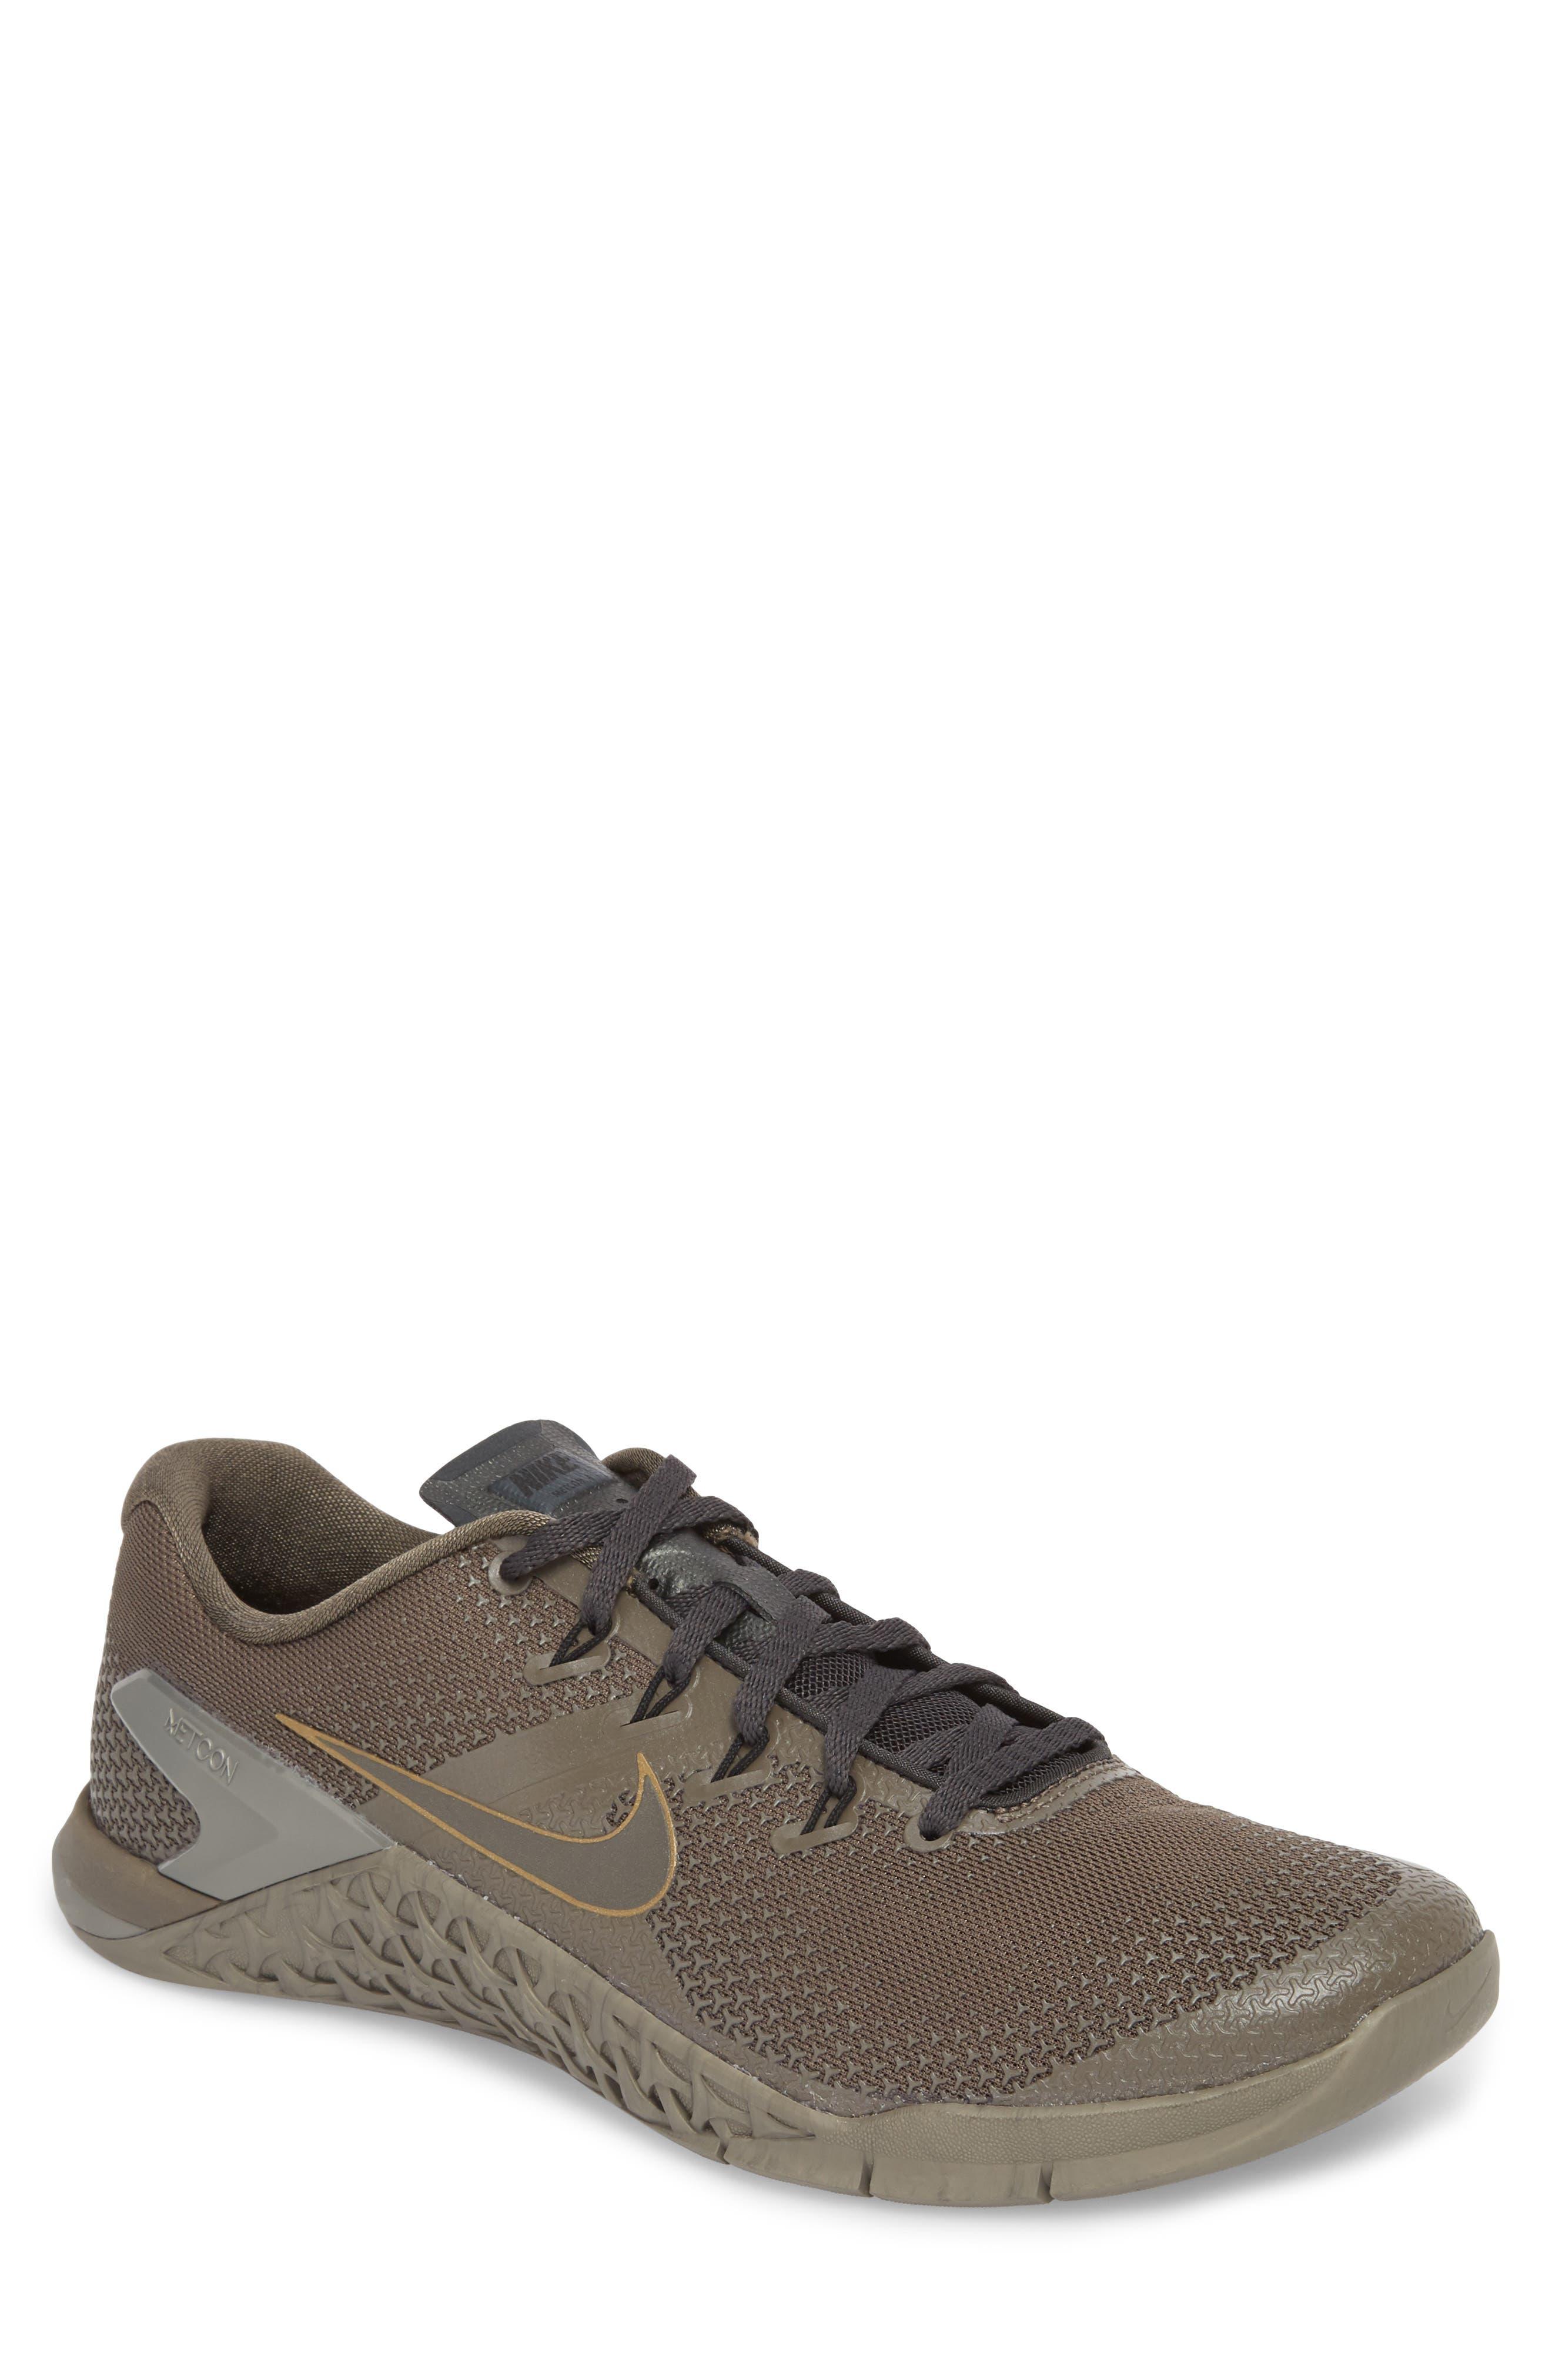 Nike Metcon 4 Viking Quest Training Shoe (Men)